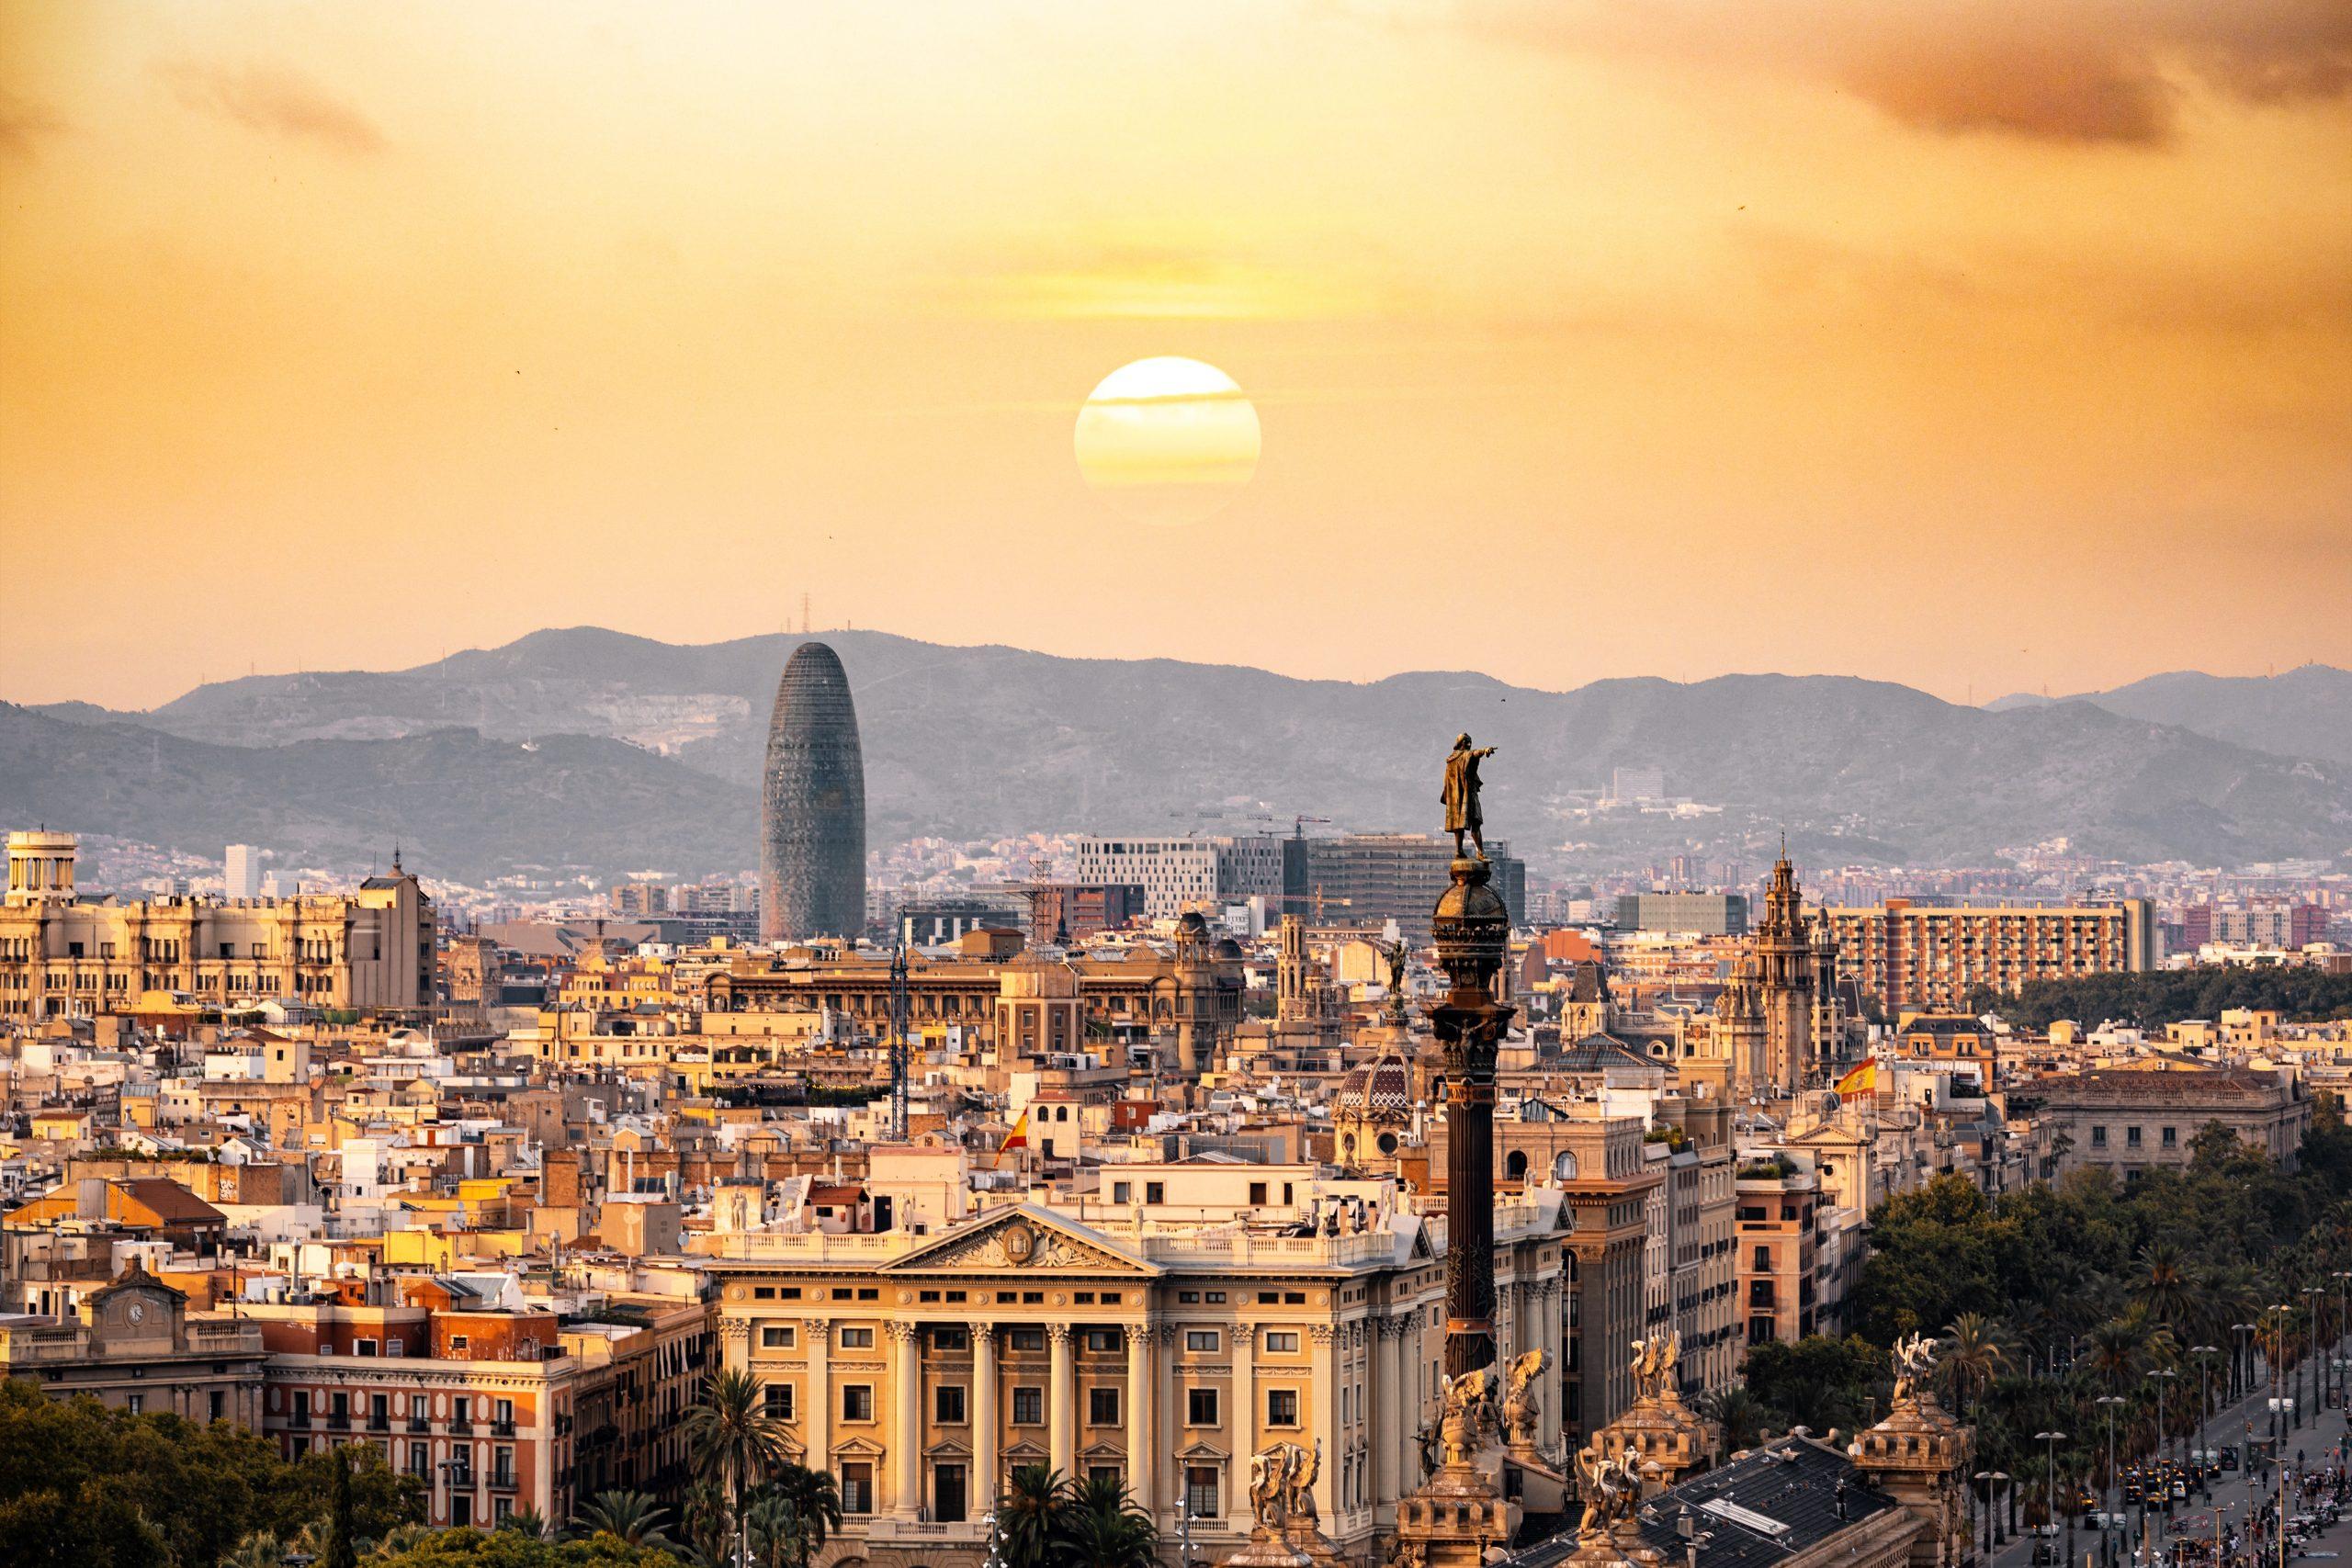 barcelona-buildings-city-1388030